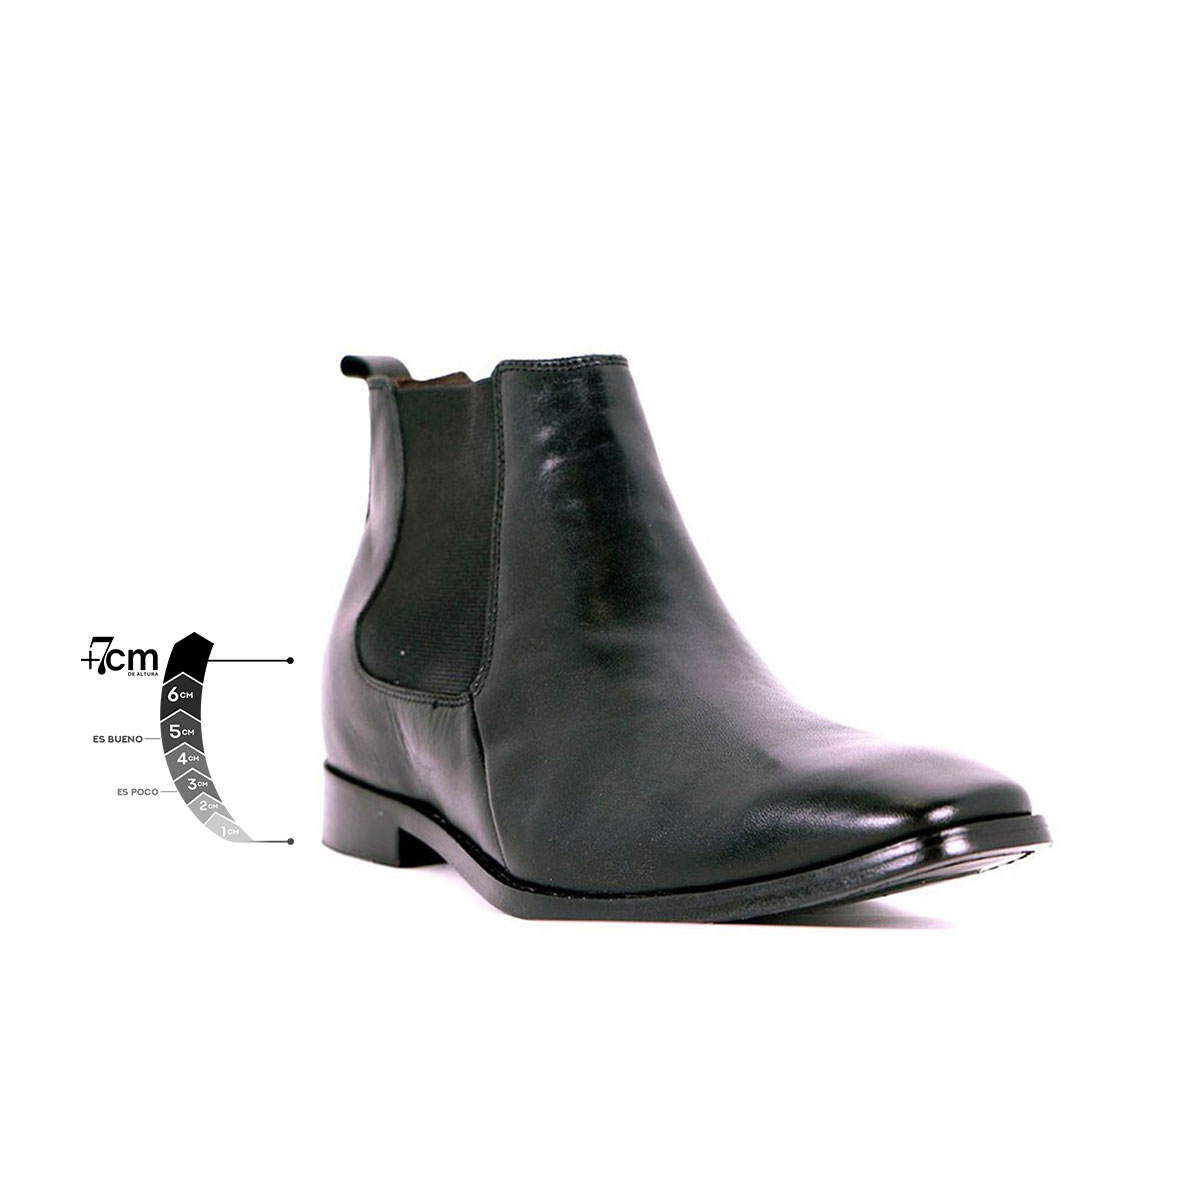 Botín Formal Lord Negro Max Denegri +7cms de Altura_76283